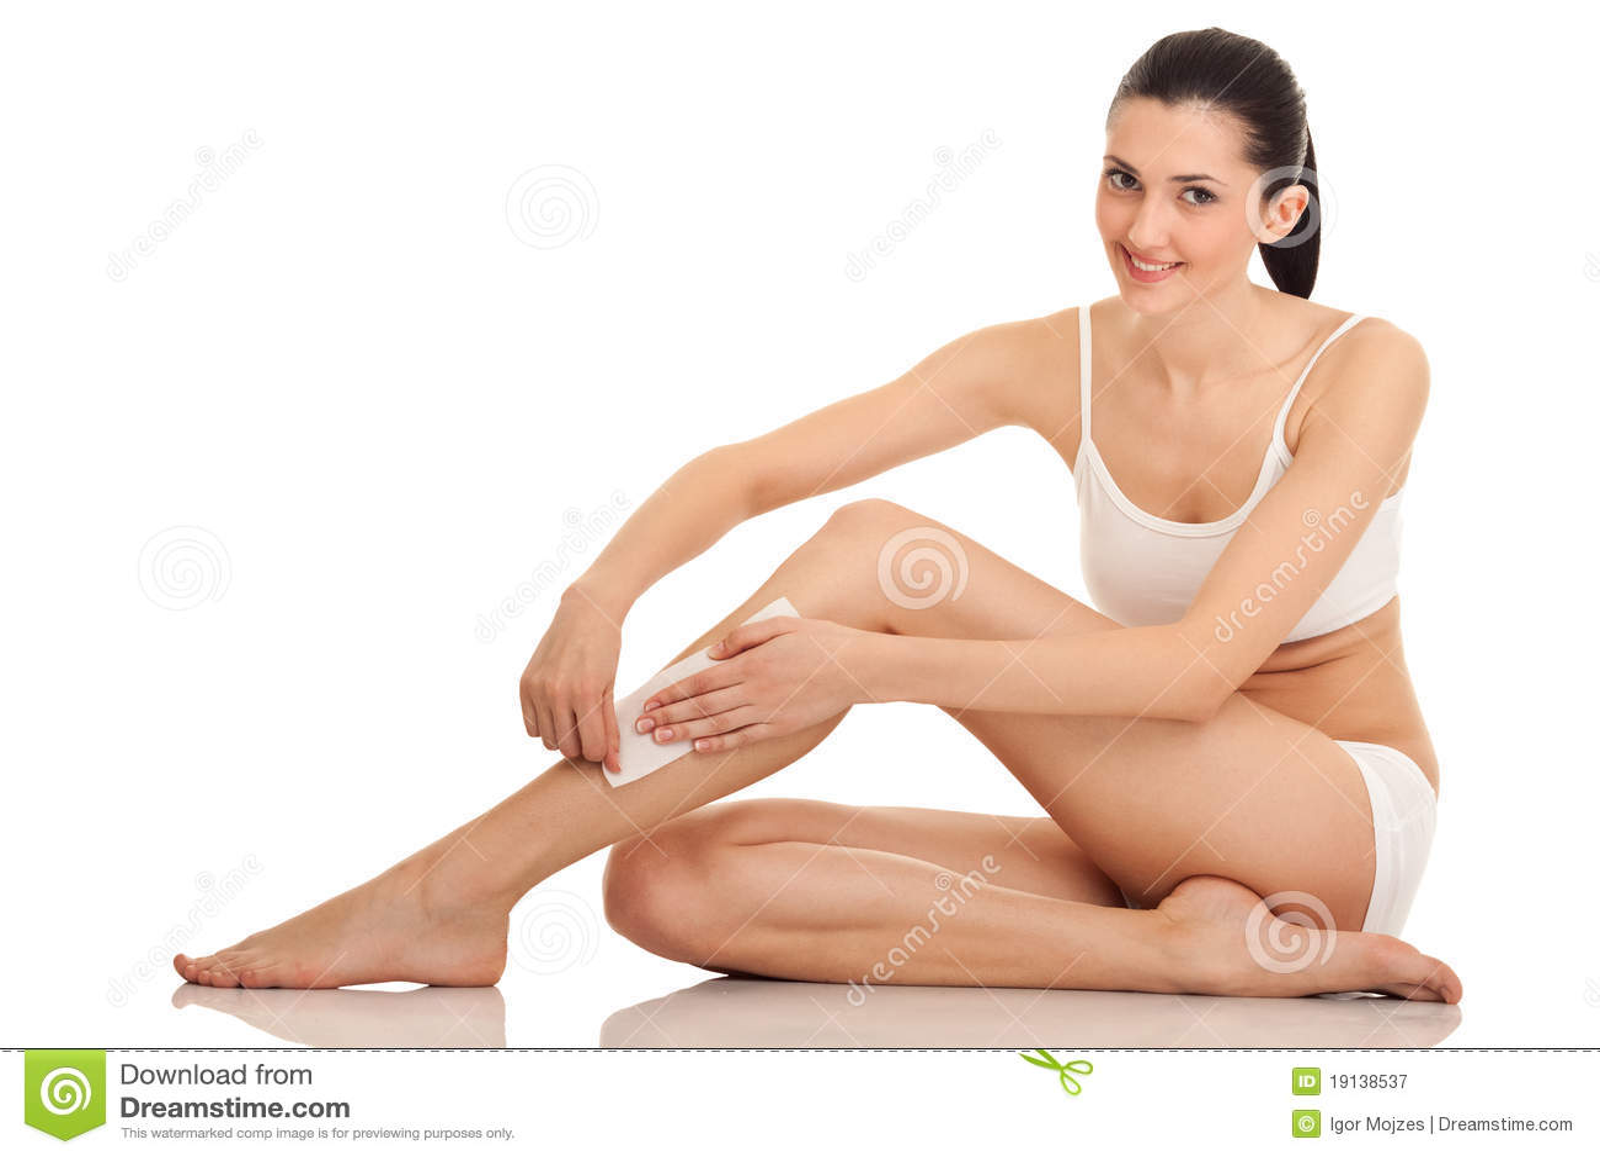 Woman doing depilation